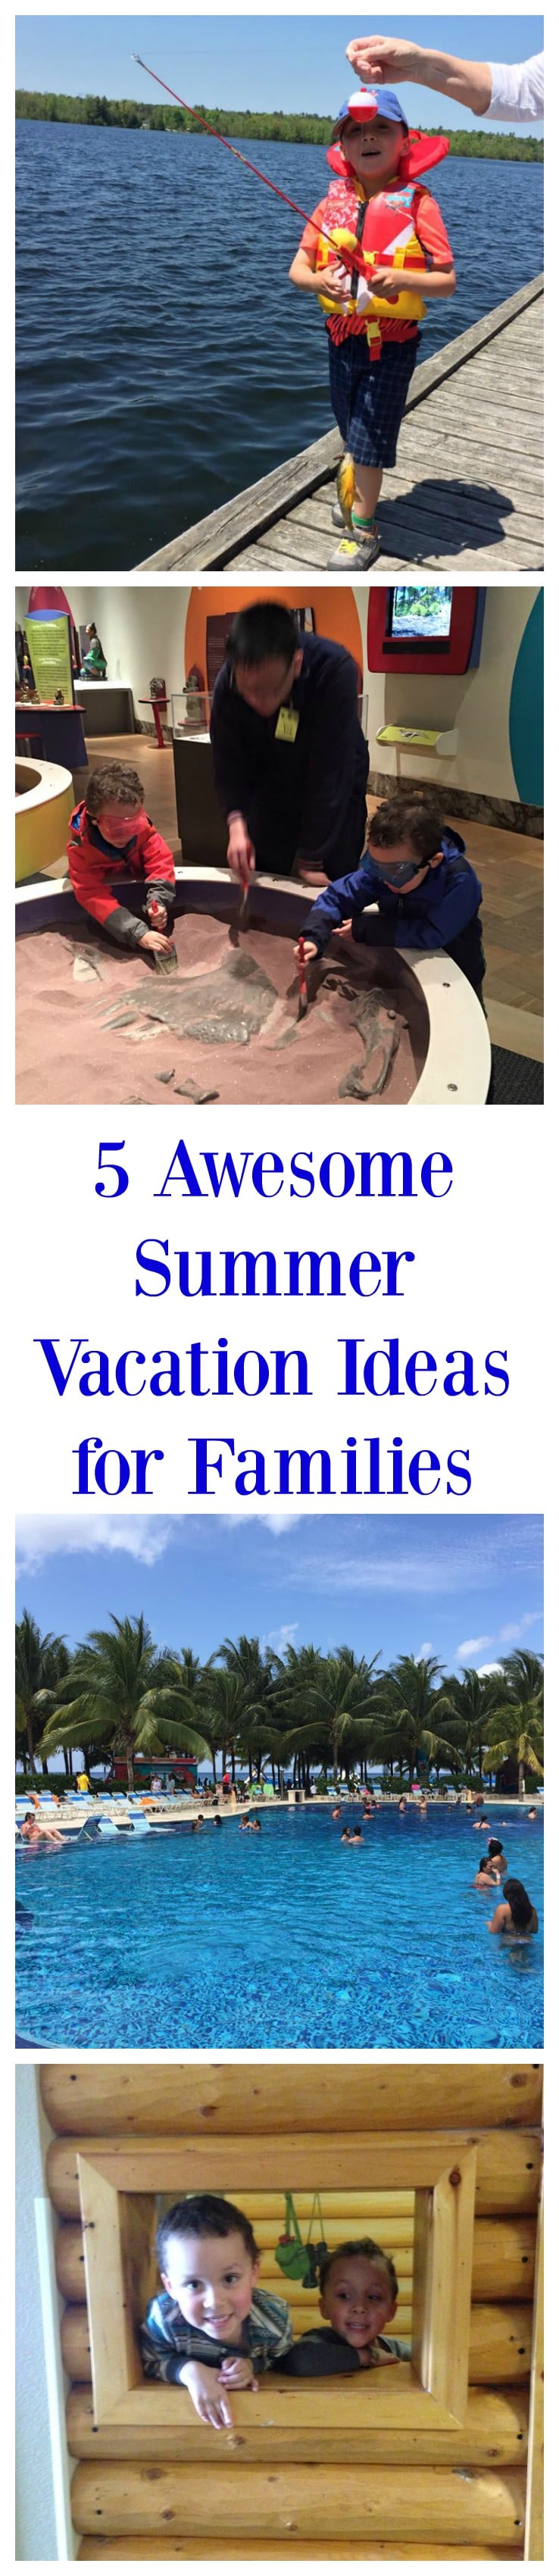 Family Summer Vacation Ideas